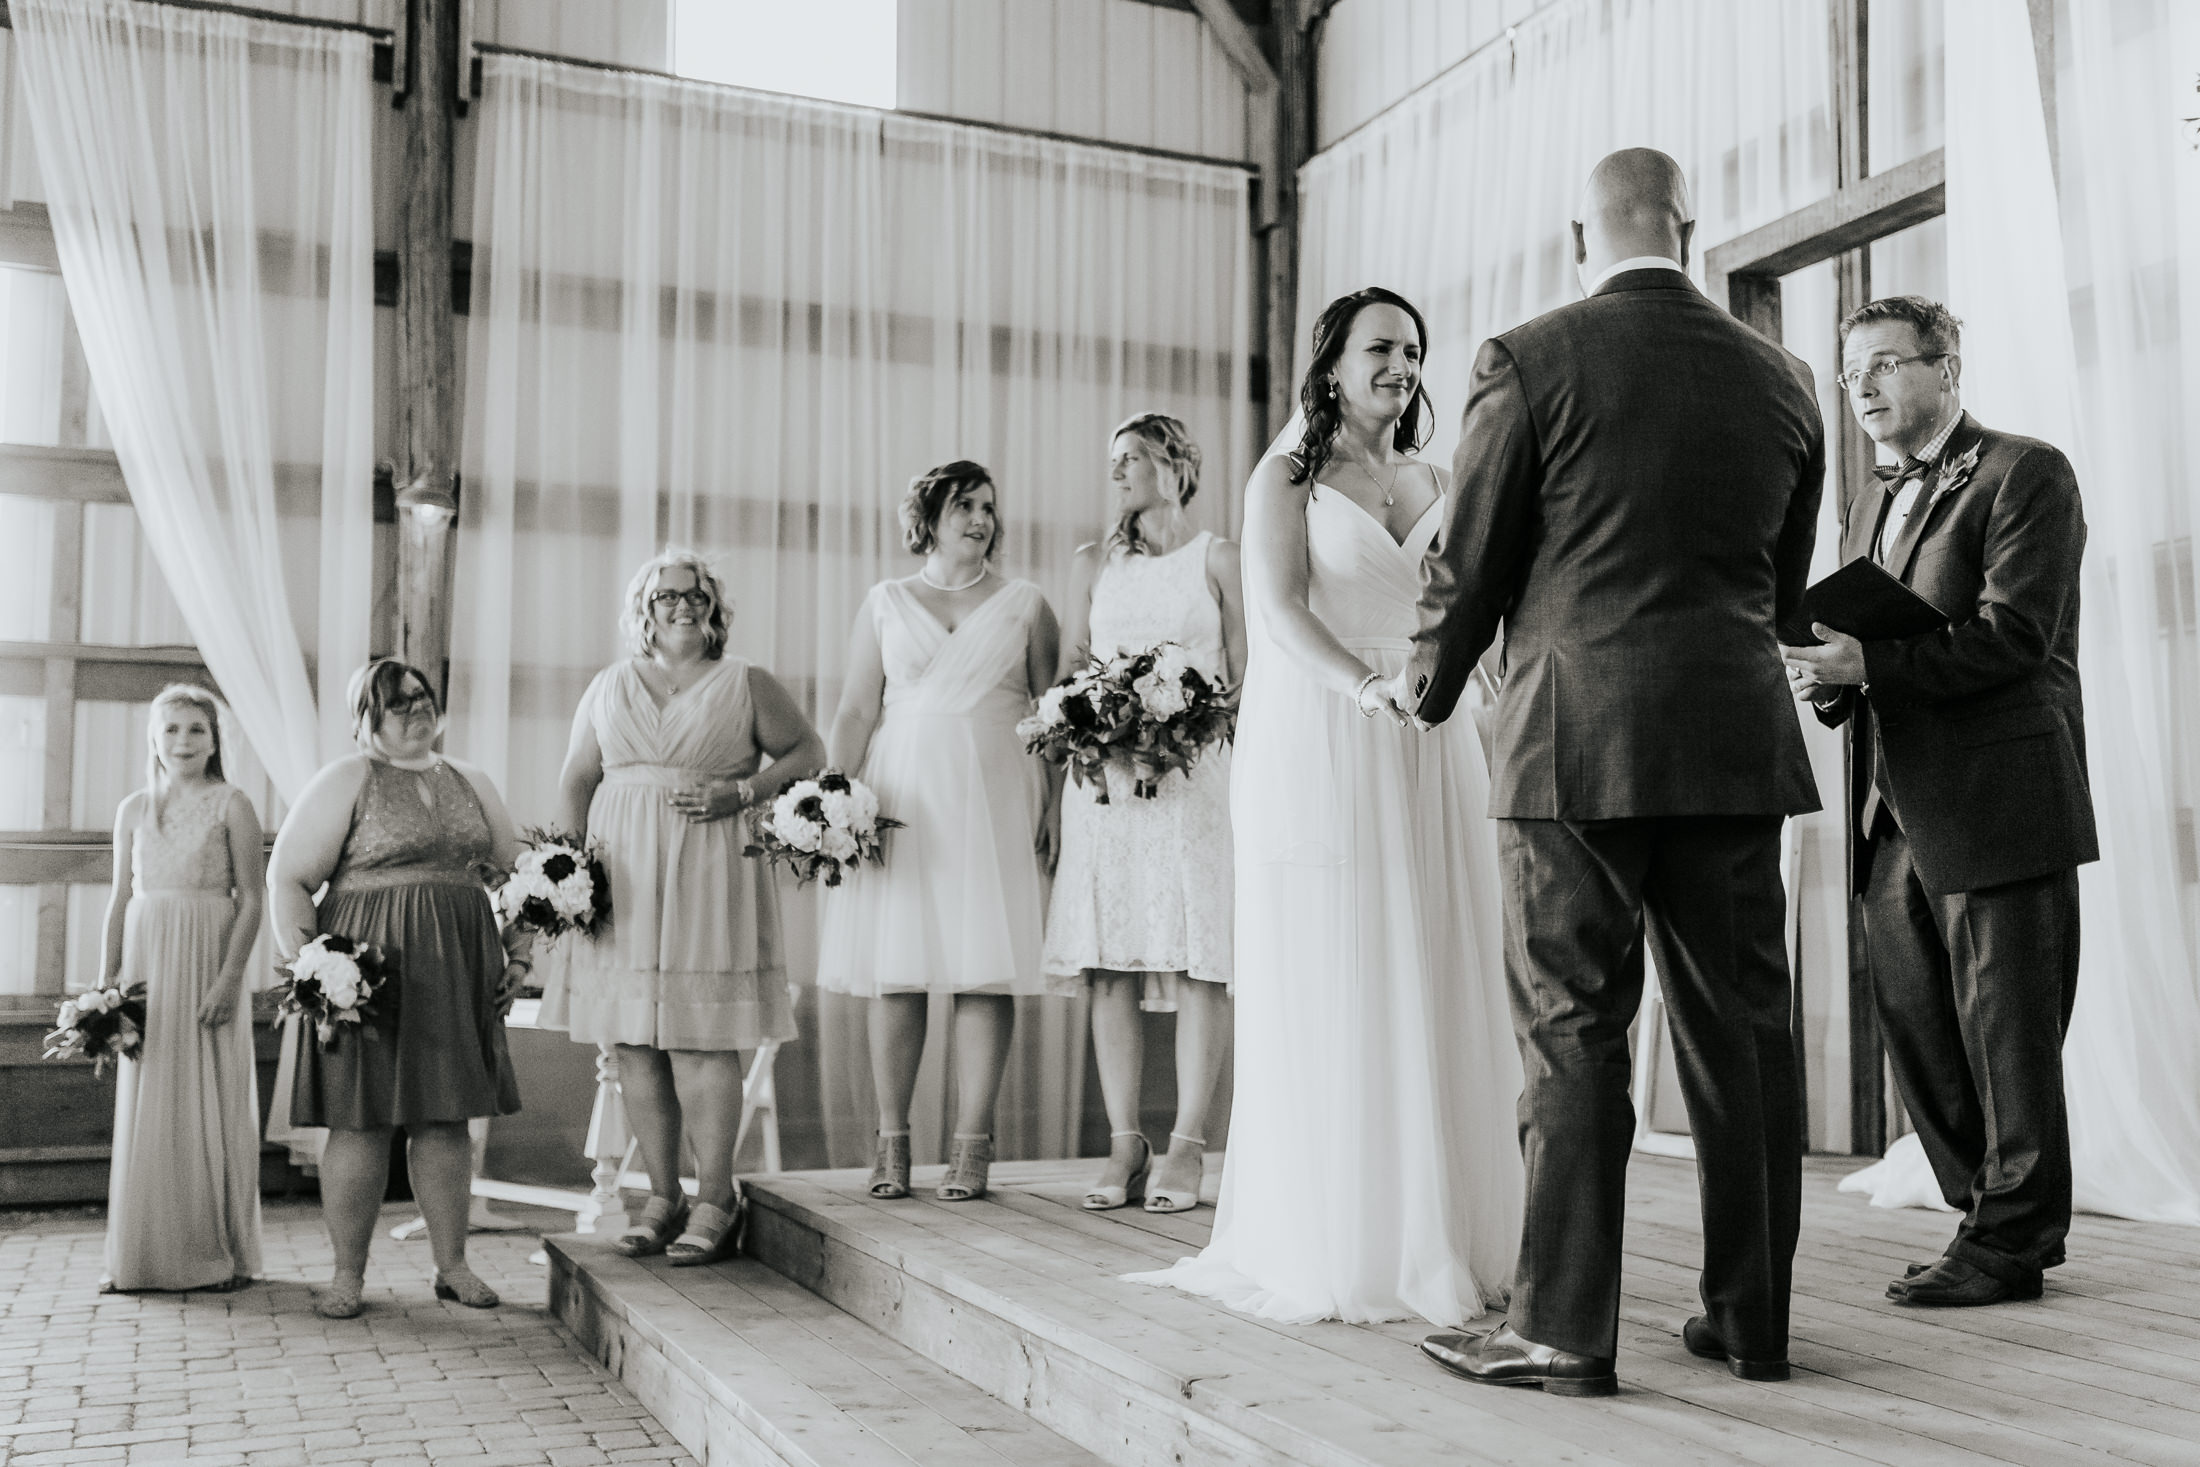 kevin&lori_wedding_041.jpg